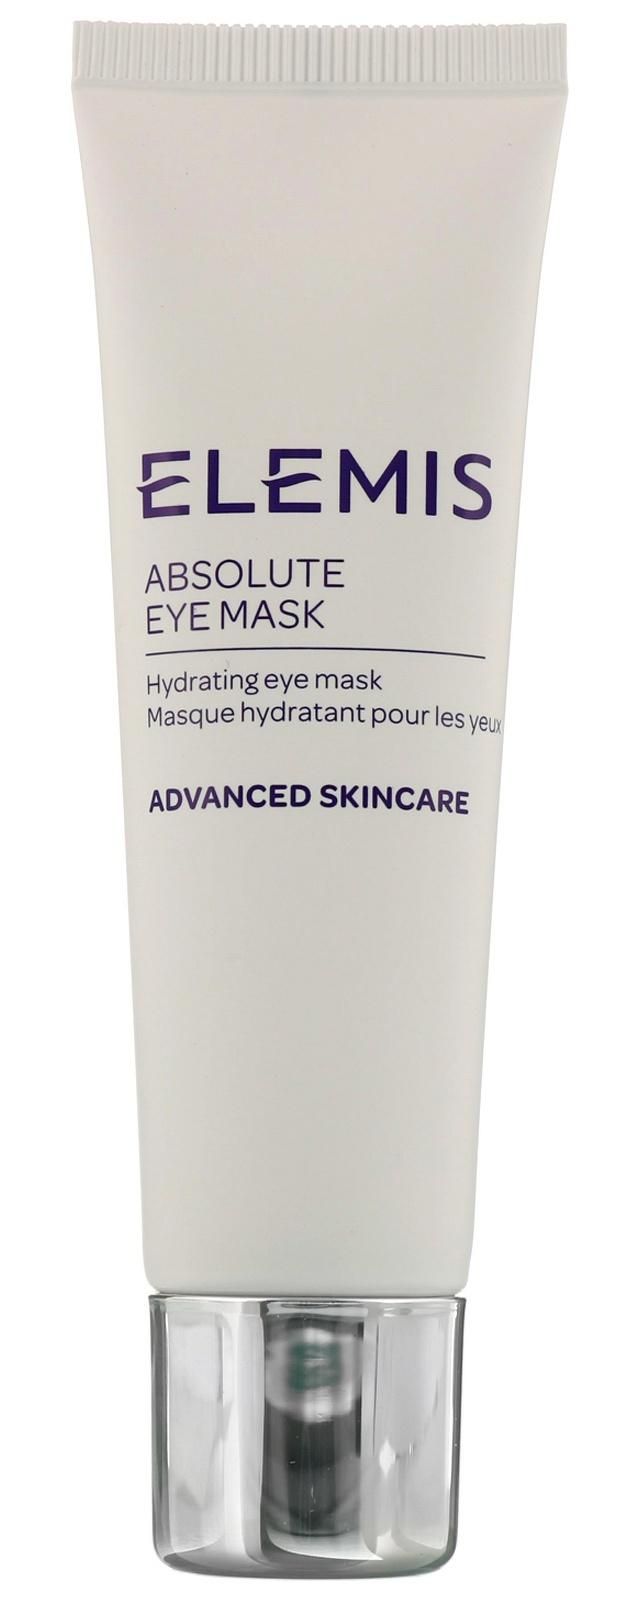 Elemis Absolute Eye Mask